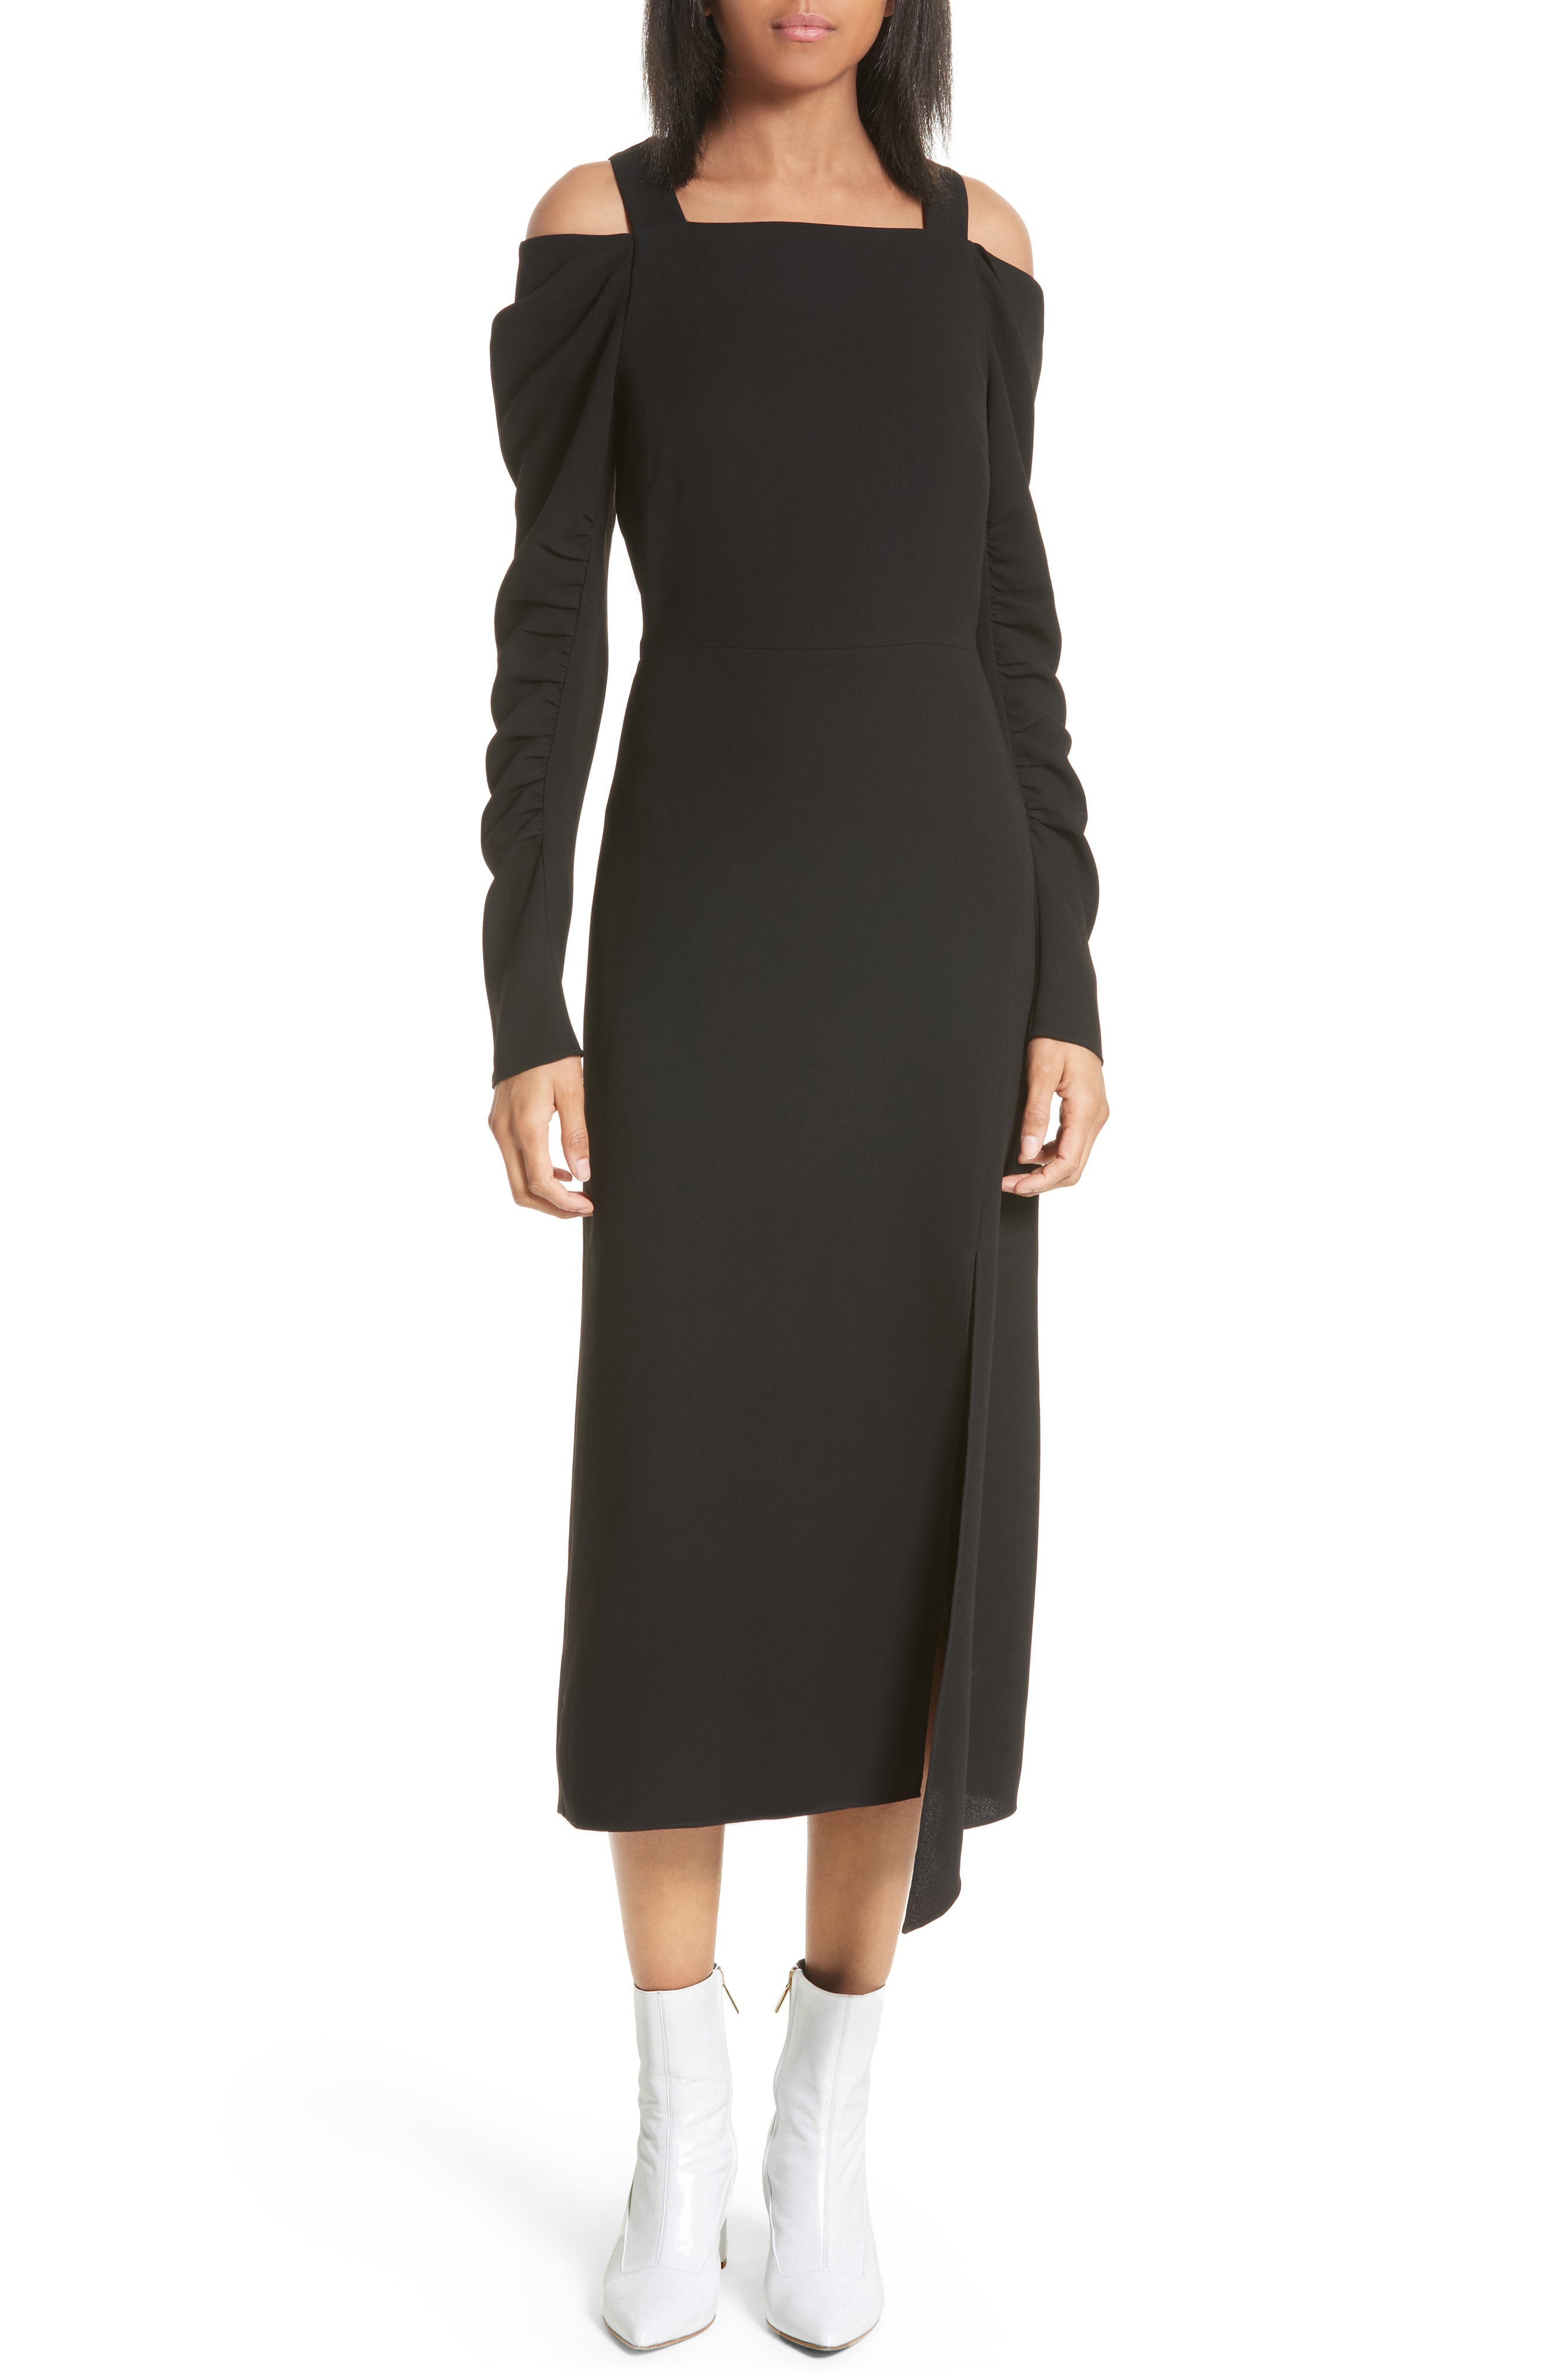 Alternate Image 1 Selected - Tibi Cold Shoulder Midi Dress